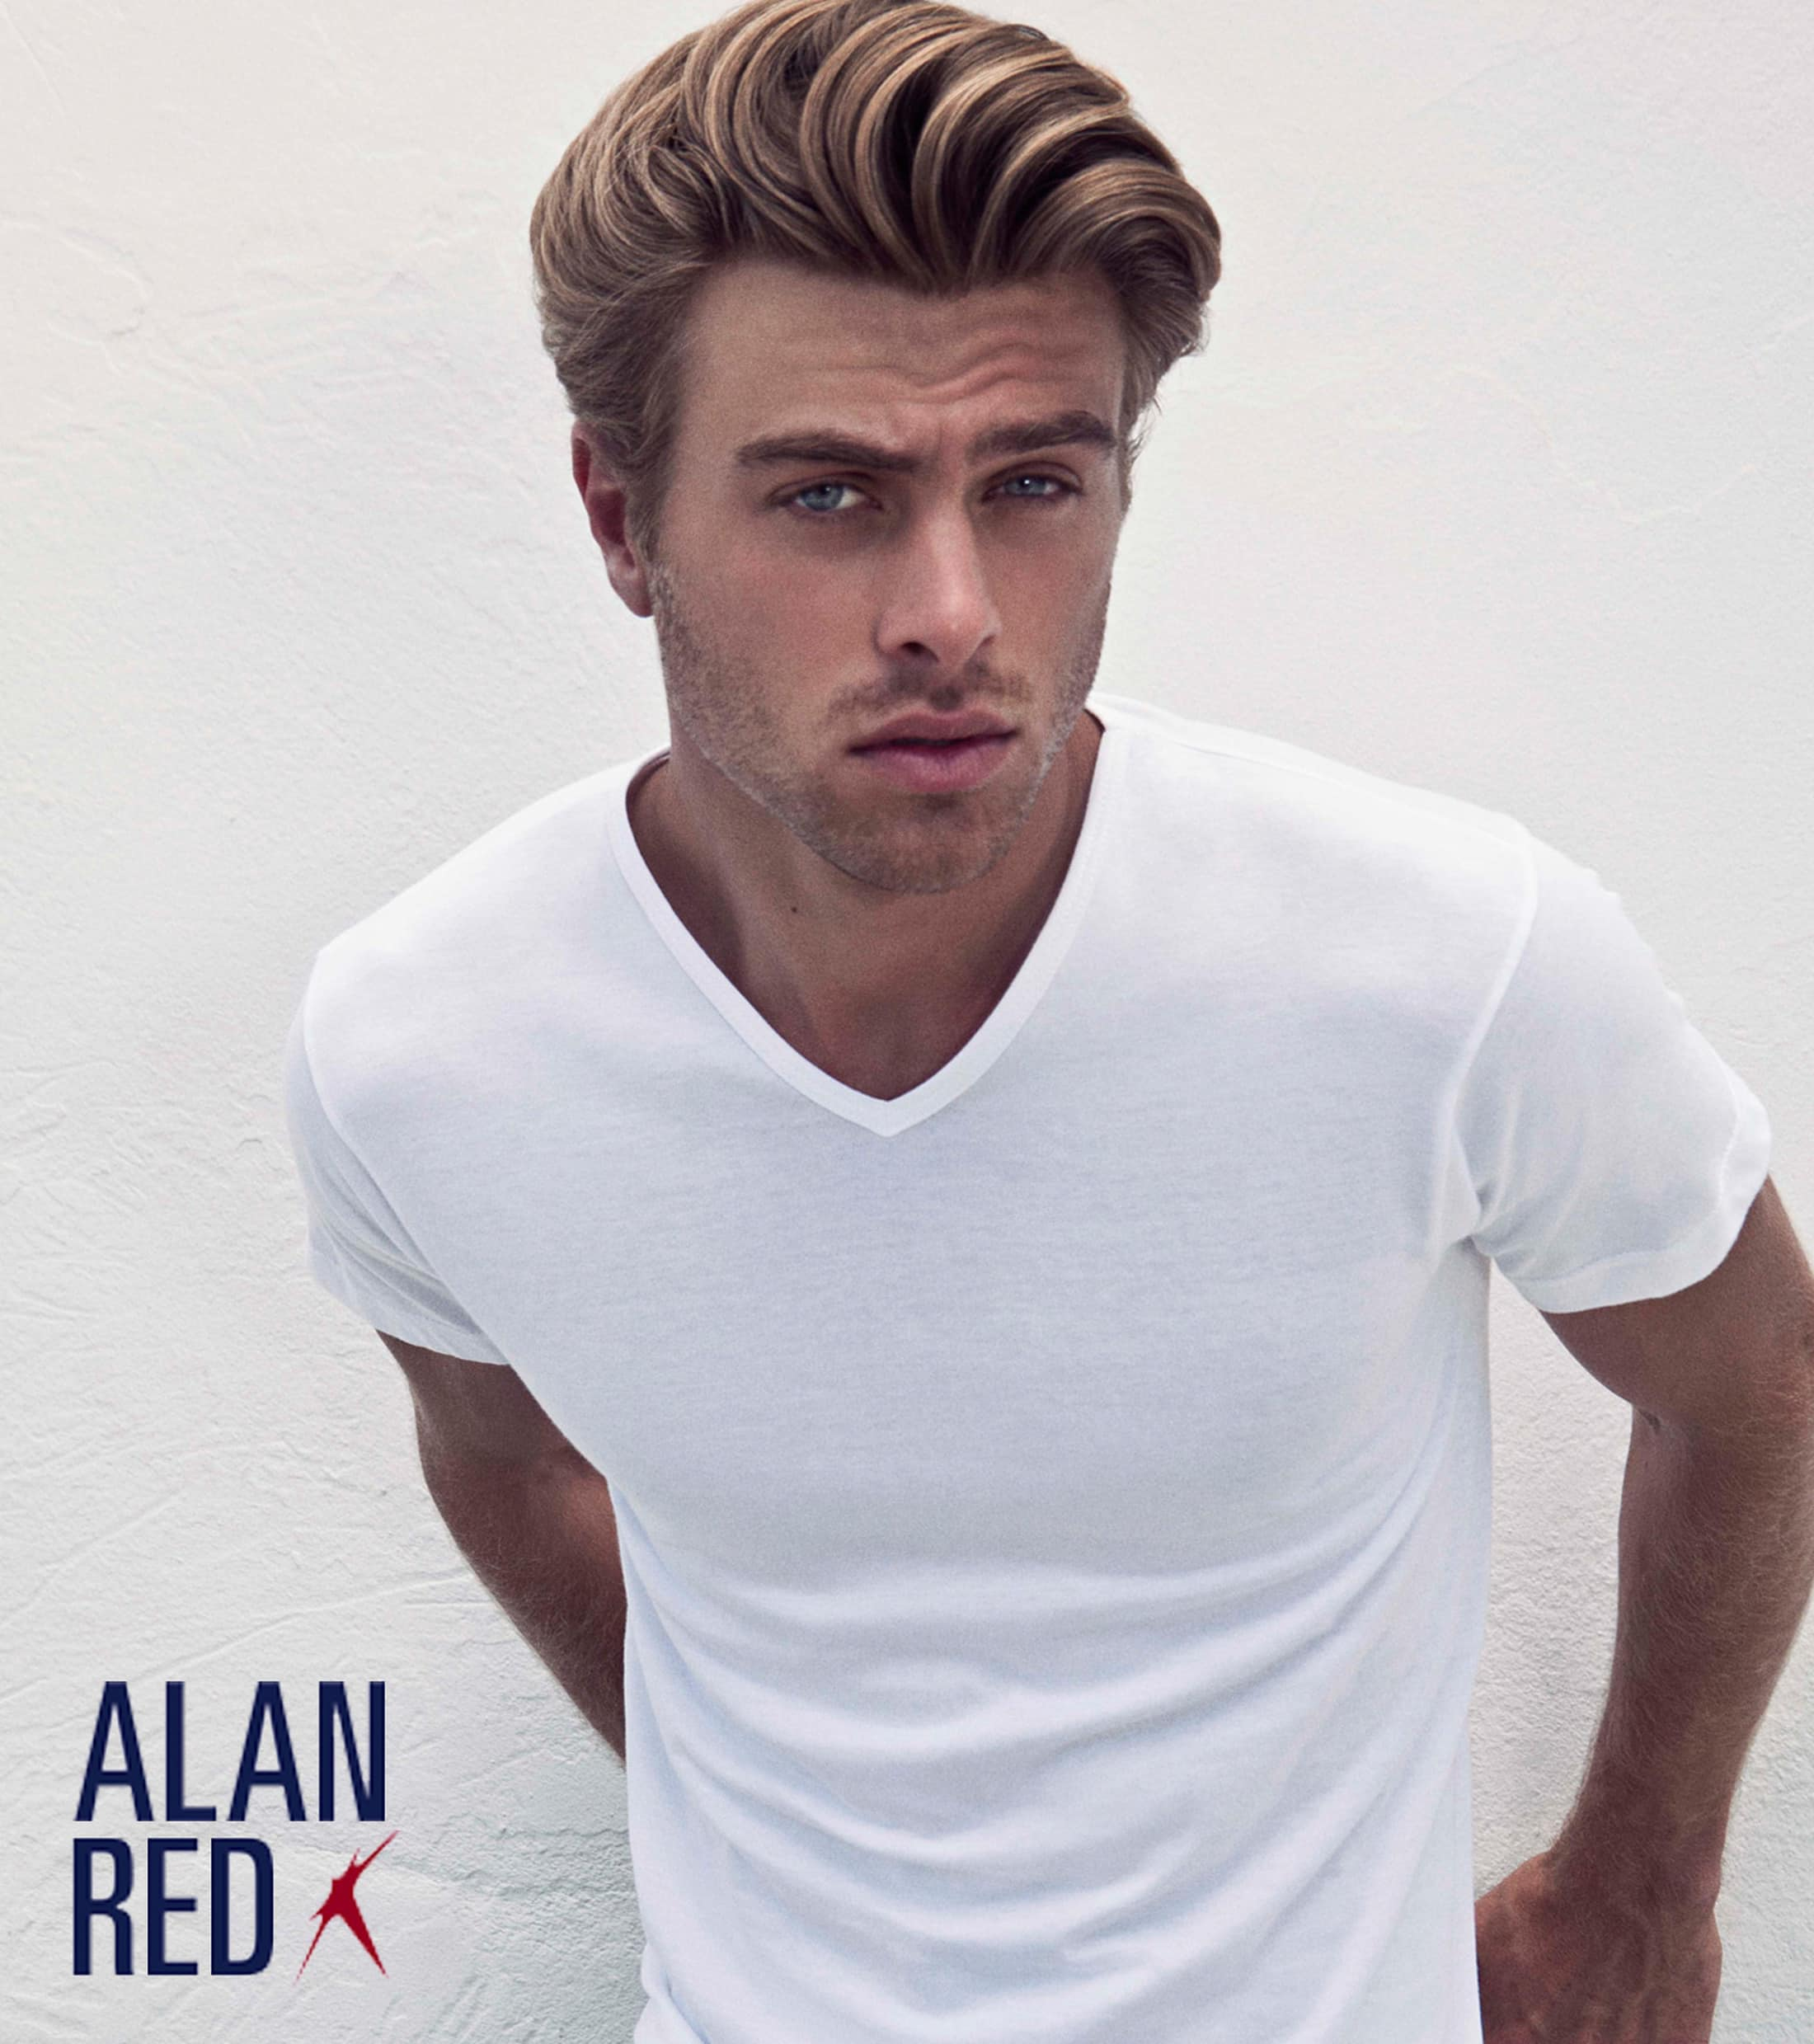 Alan Red Vermont T-Shirt V-Hals Antraciet (1Pack) foto 3